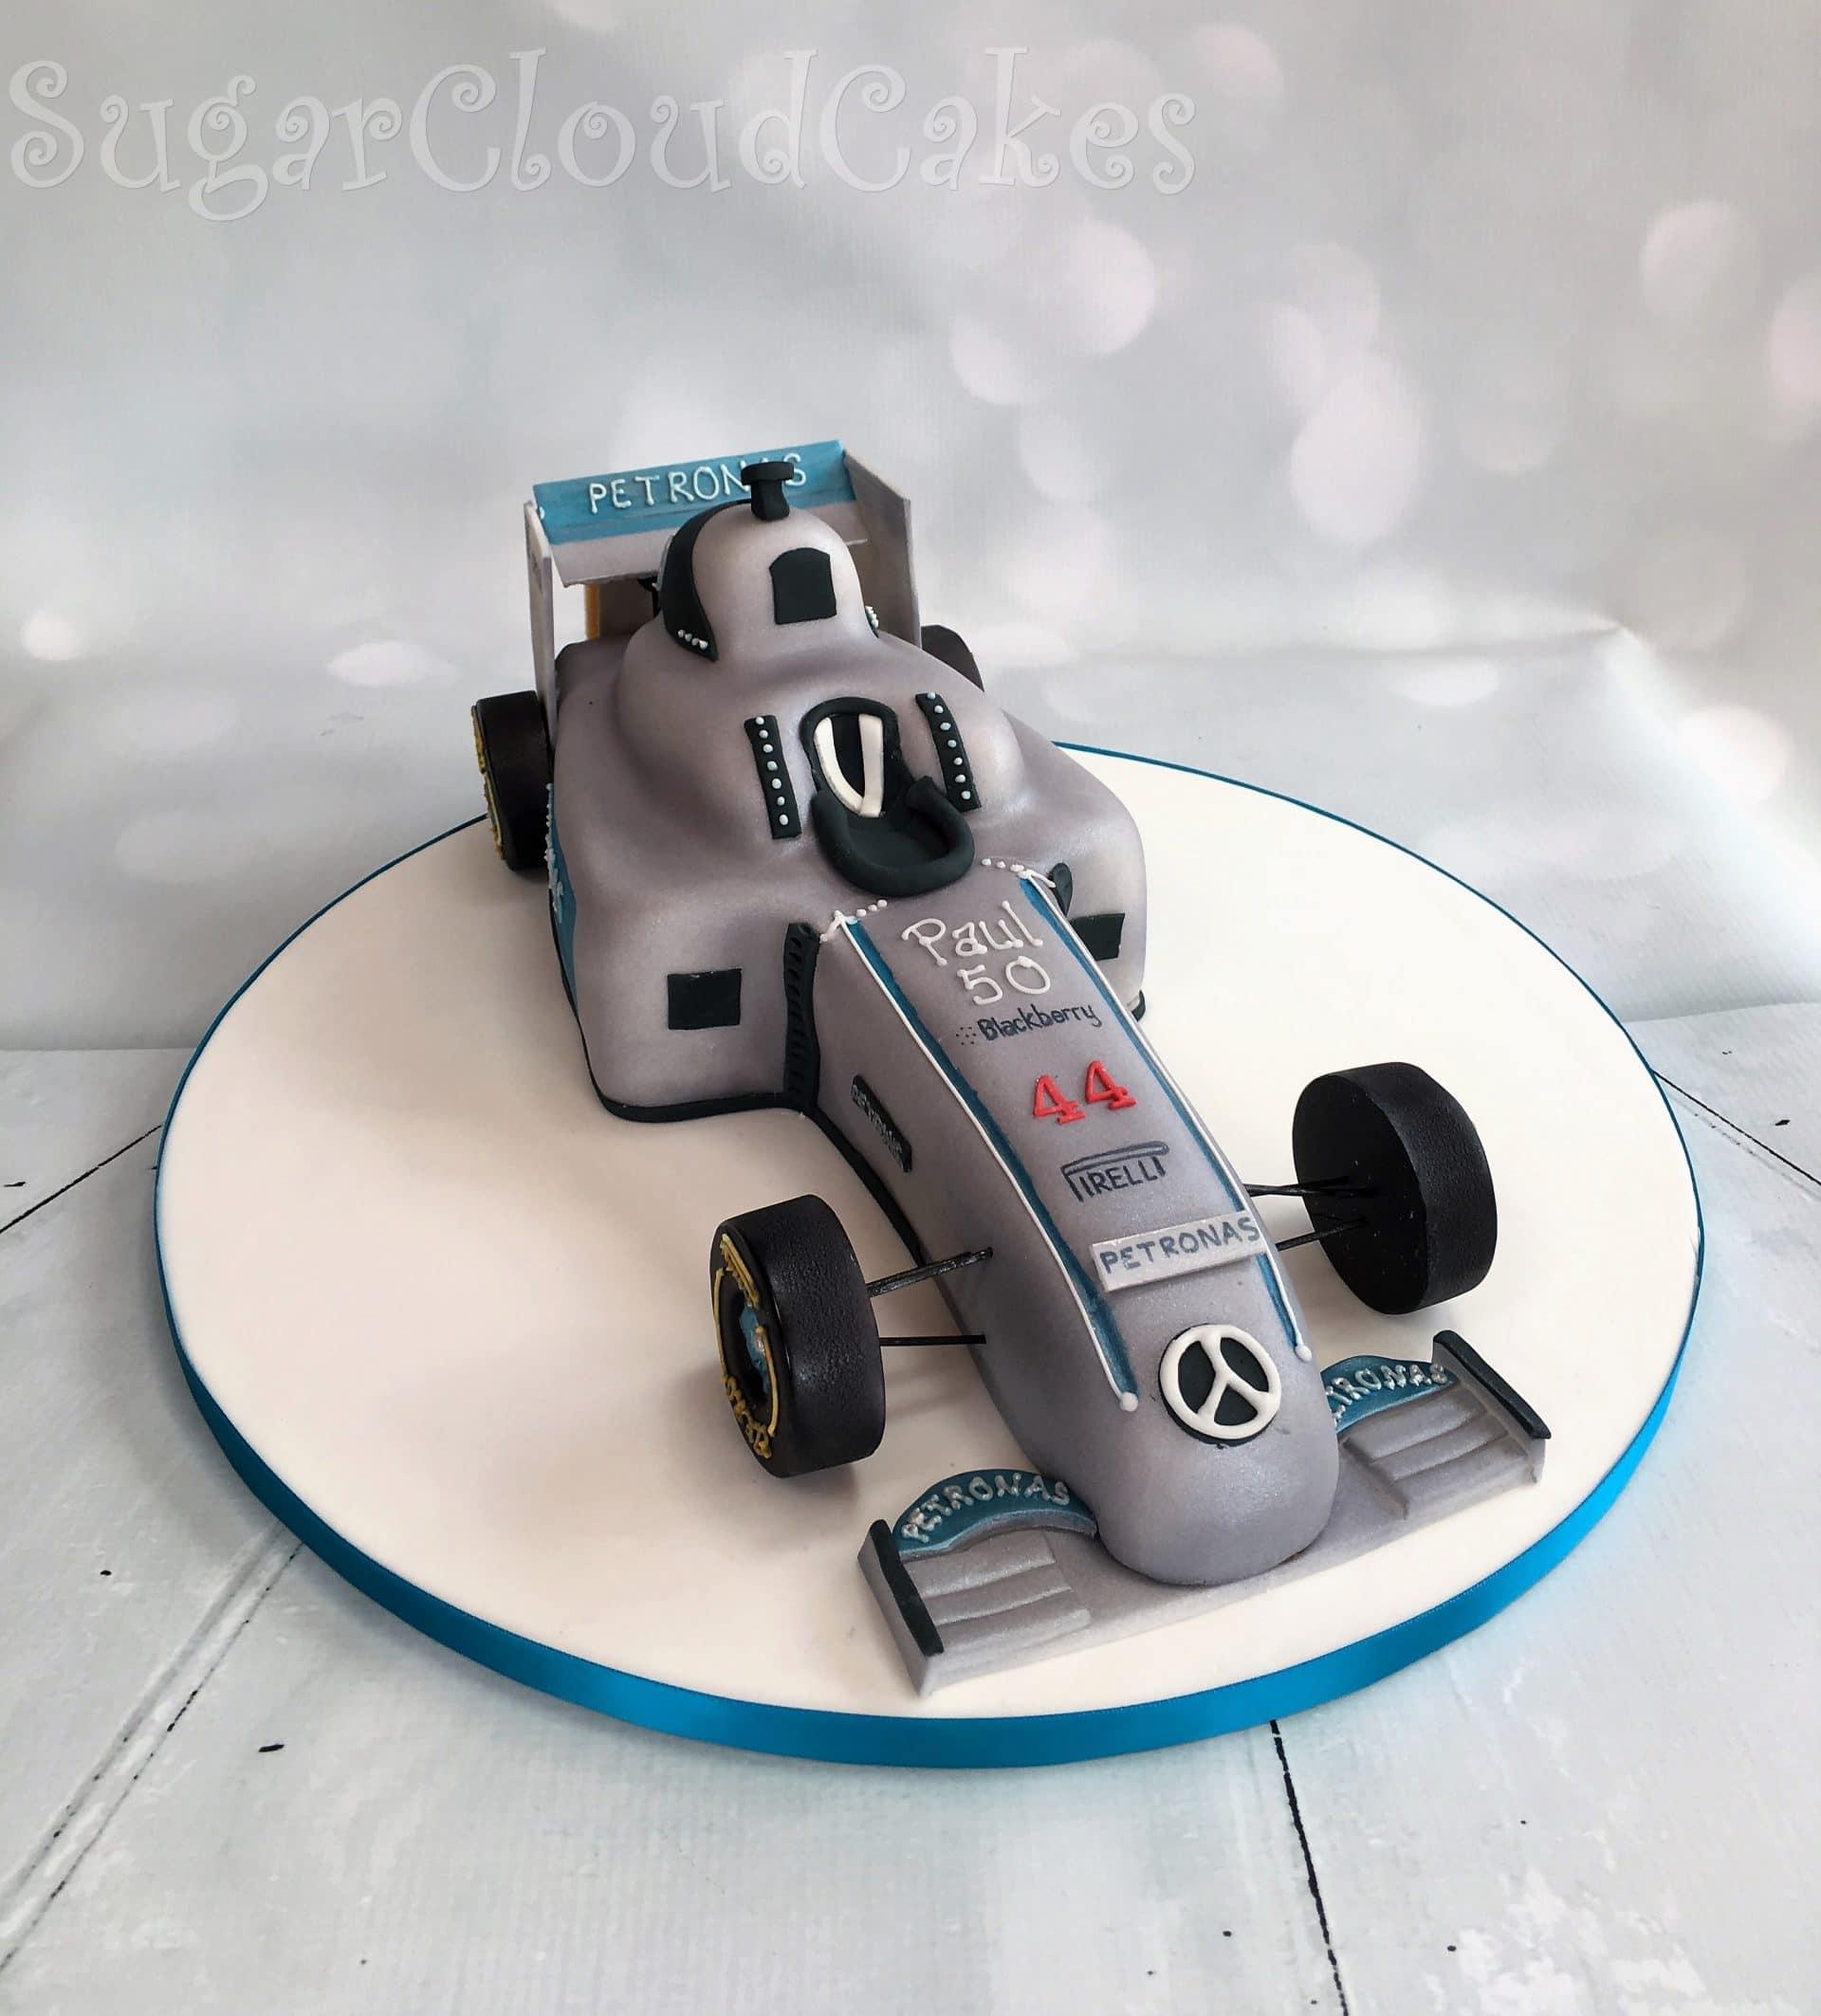 Lewis Hamilton F1 race car 50th birthday cake, Sandbach